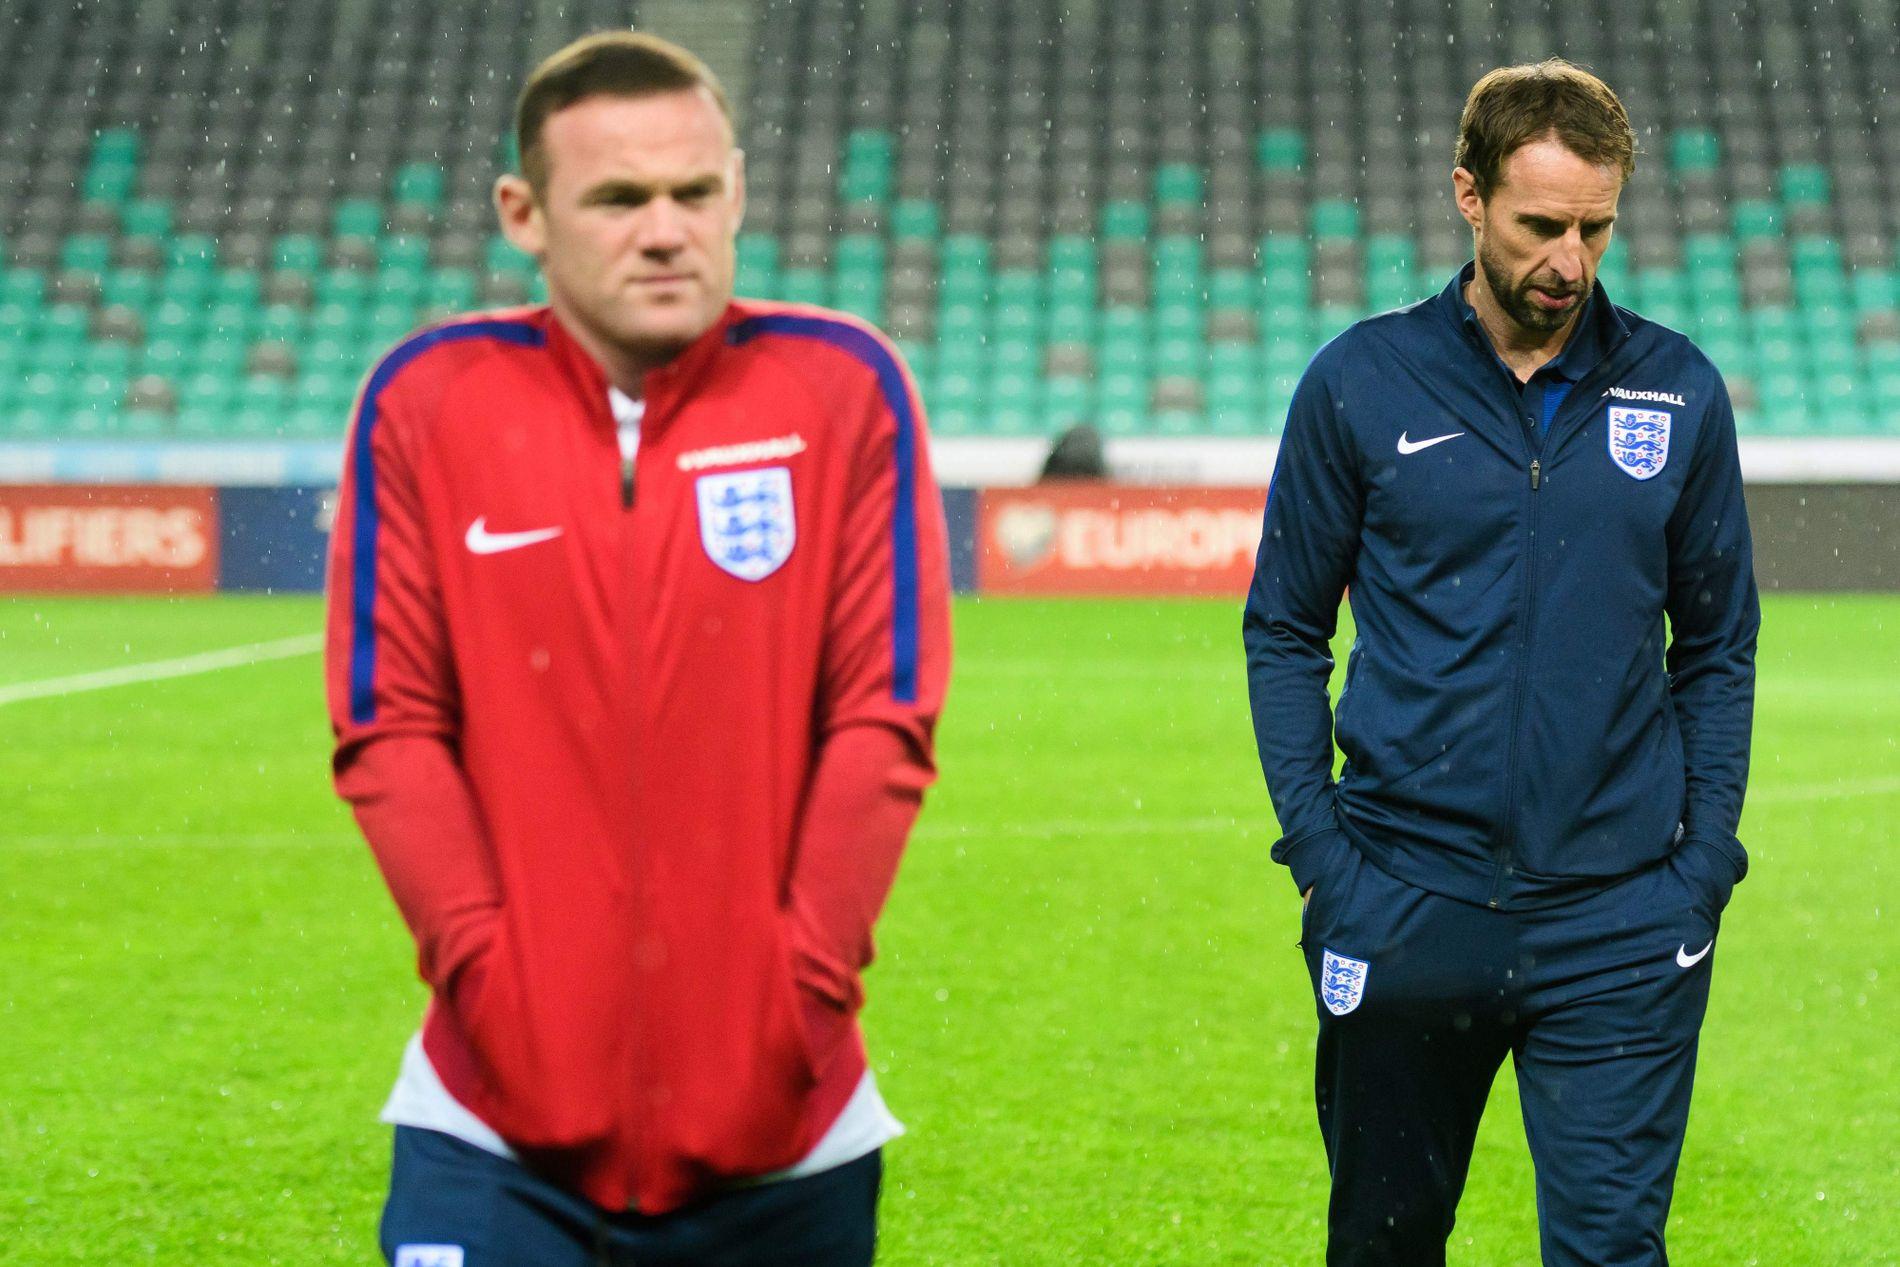 I KULDEN? Wayne Rooney trekker sammen skuldrene i høstværet  på Slovenias hjemmearena i hovedstaden Ljubljana før  VM-kvalikkampen i kveld. Her sammen med Englands vikarsjef Gareth Southgate.